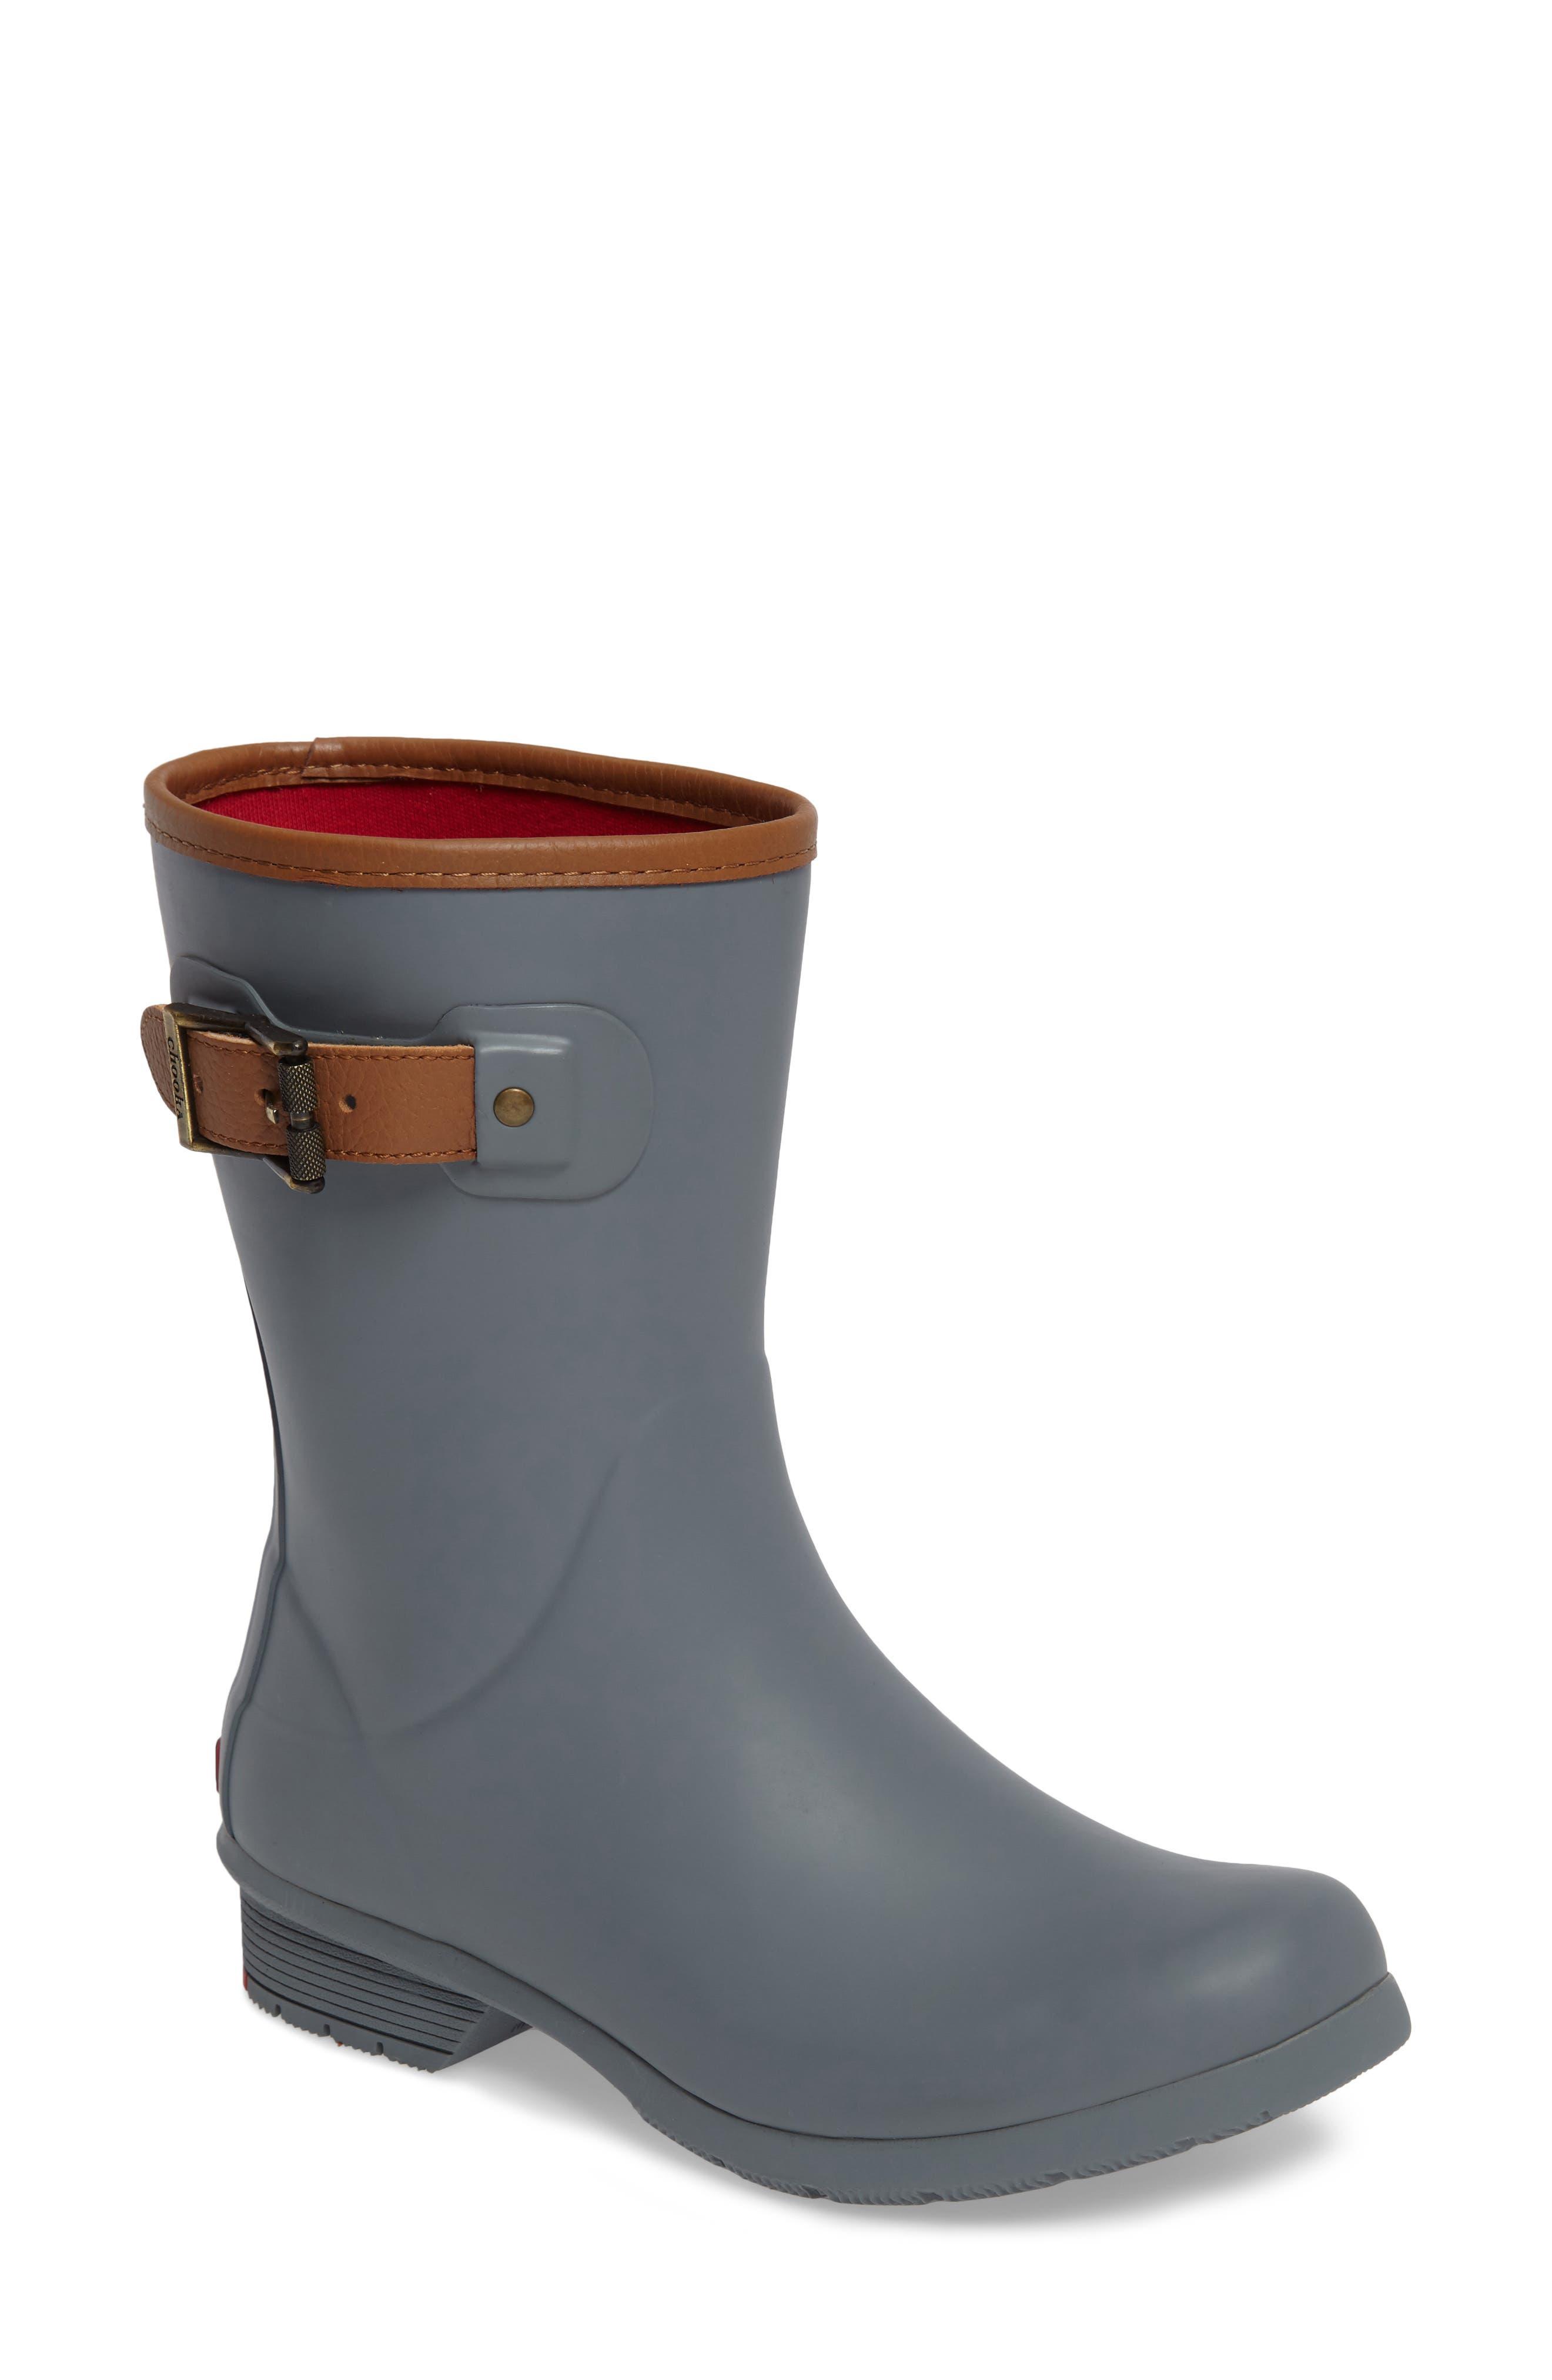 Main Image - Chooka City Solid Mid Height Rain Boot (Women)